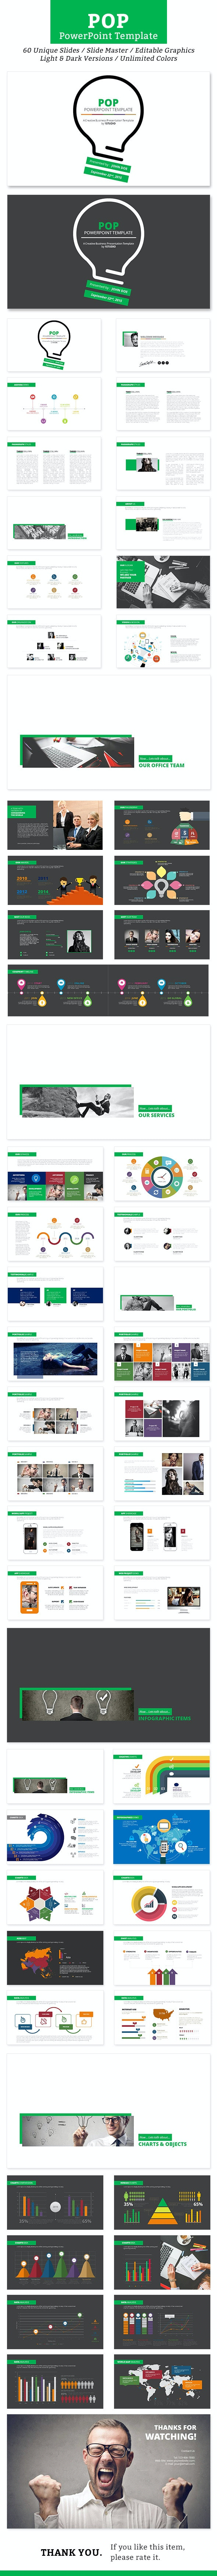 Pop PowerPoint Template - Business PowerPoint Templates